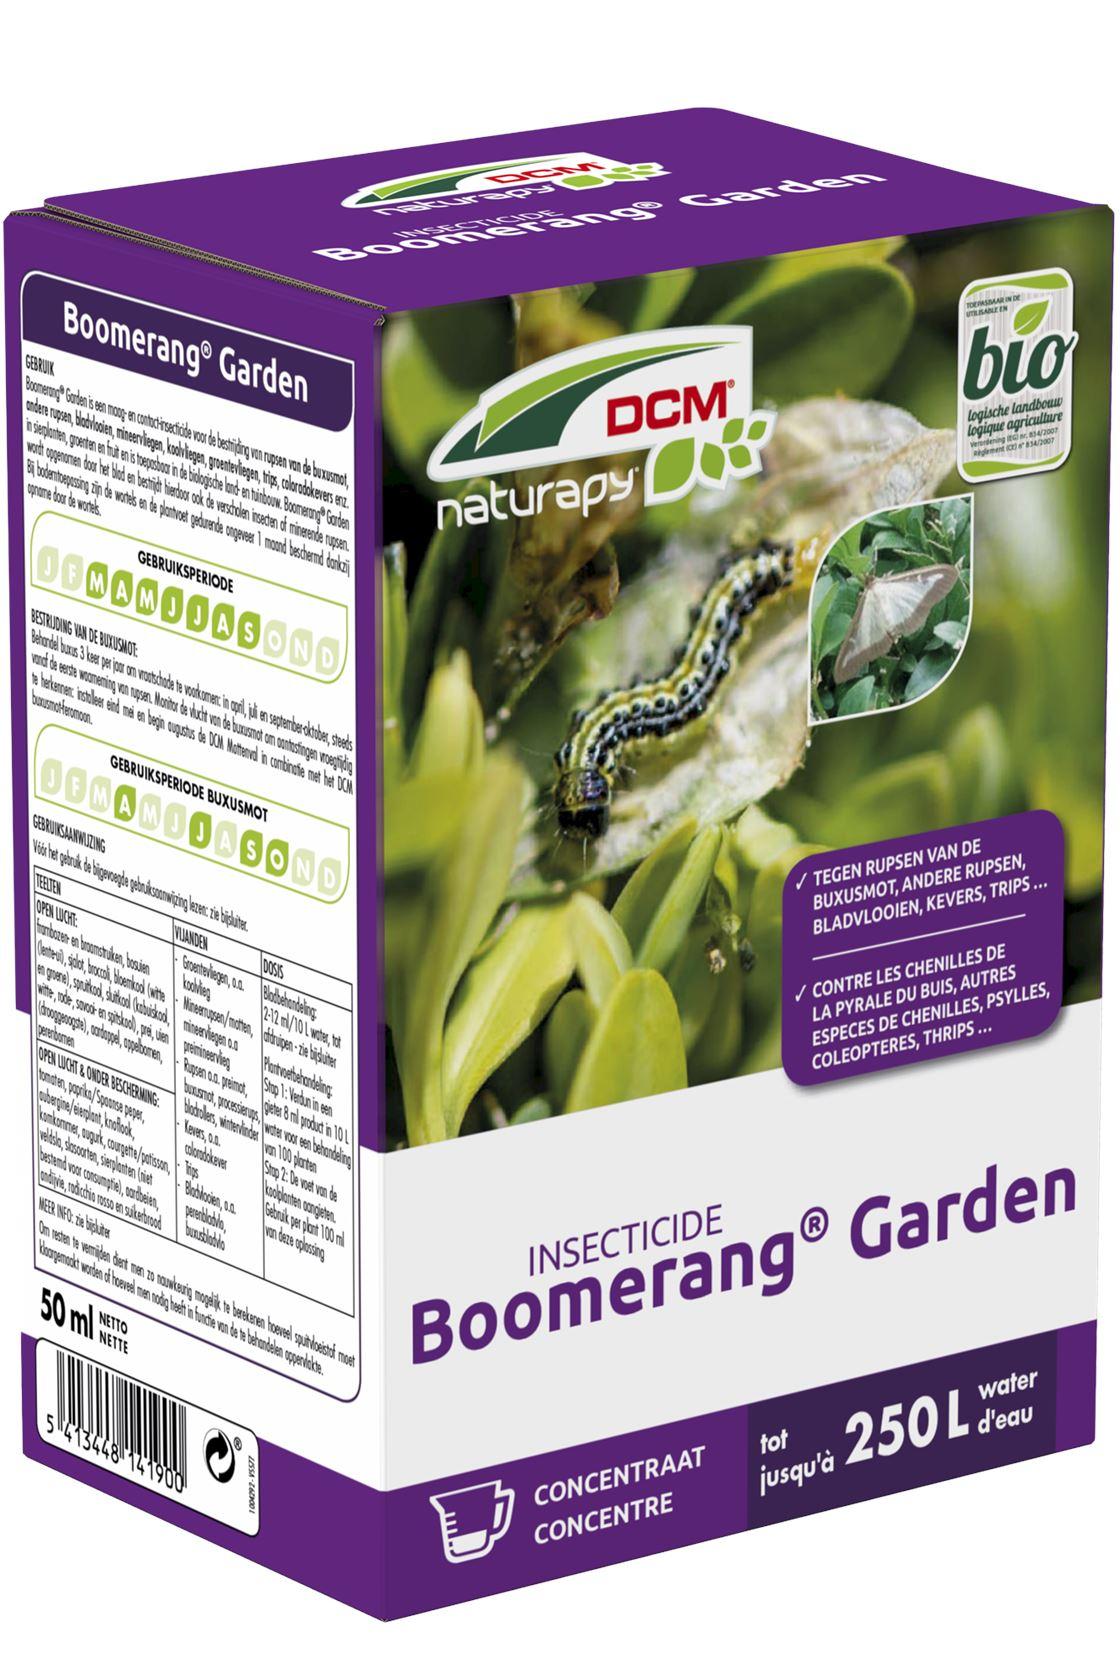 DCM boomerang garden moestuin - 50ml - bio